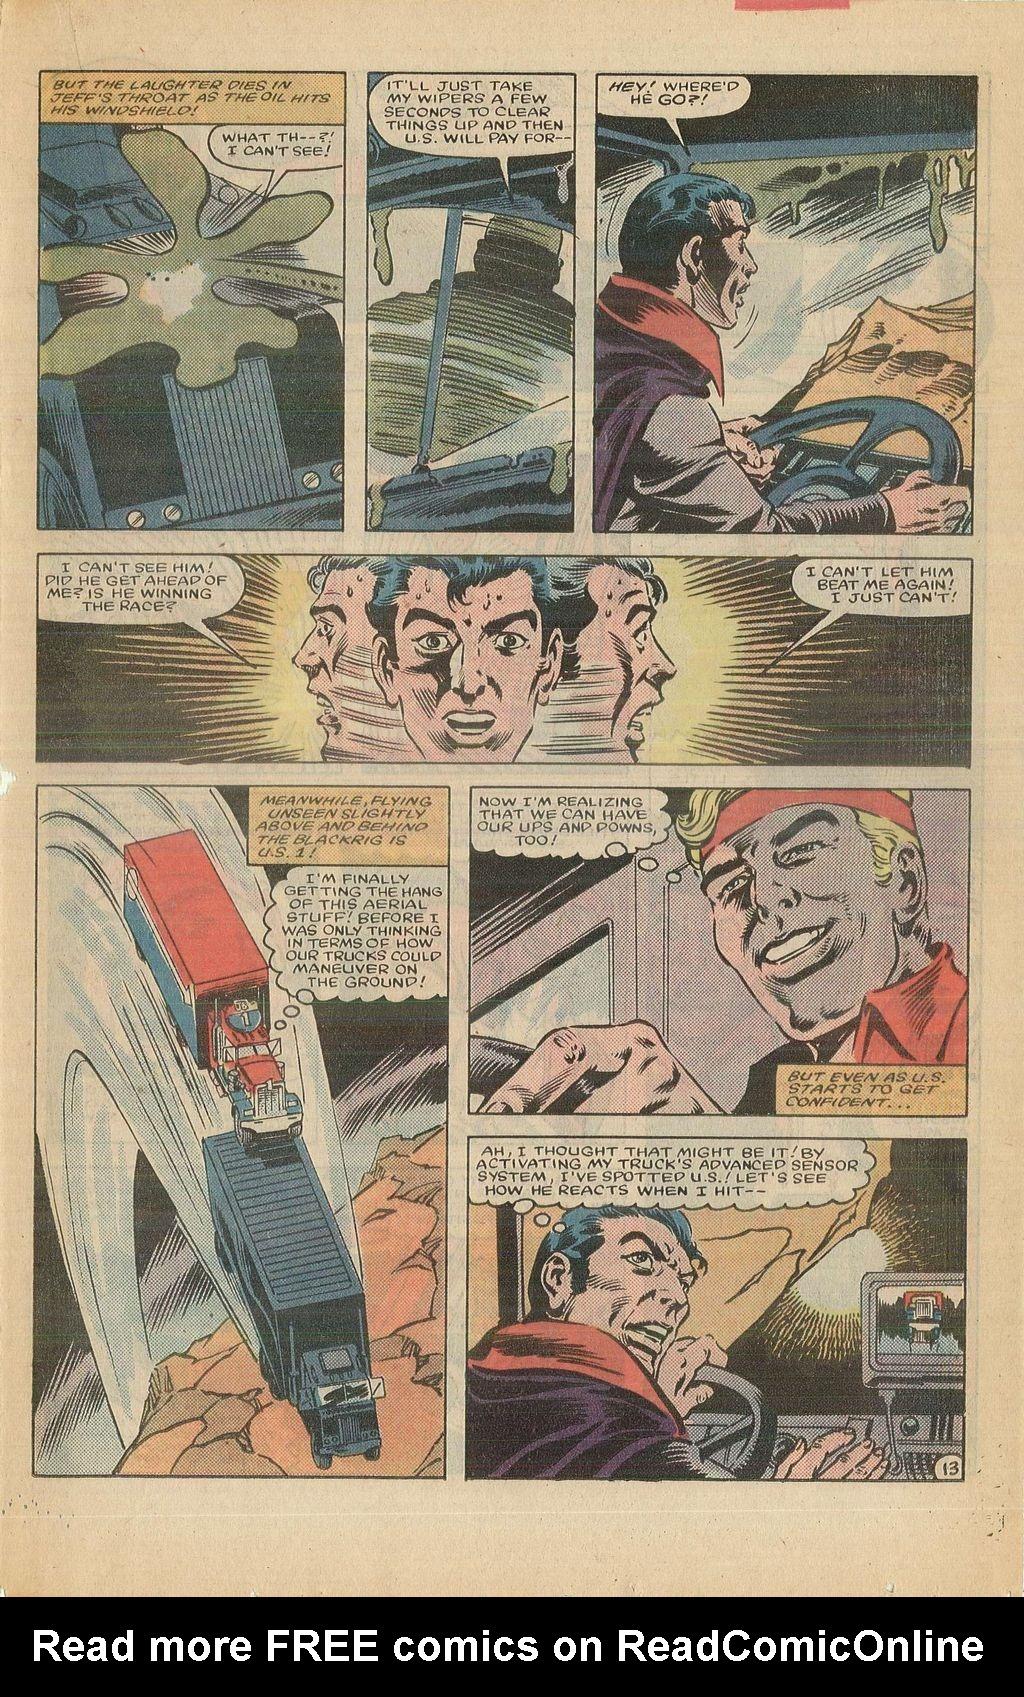 Read online U.S. 1 comic -  Issue #12 - 19